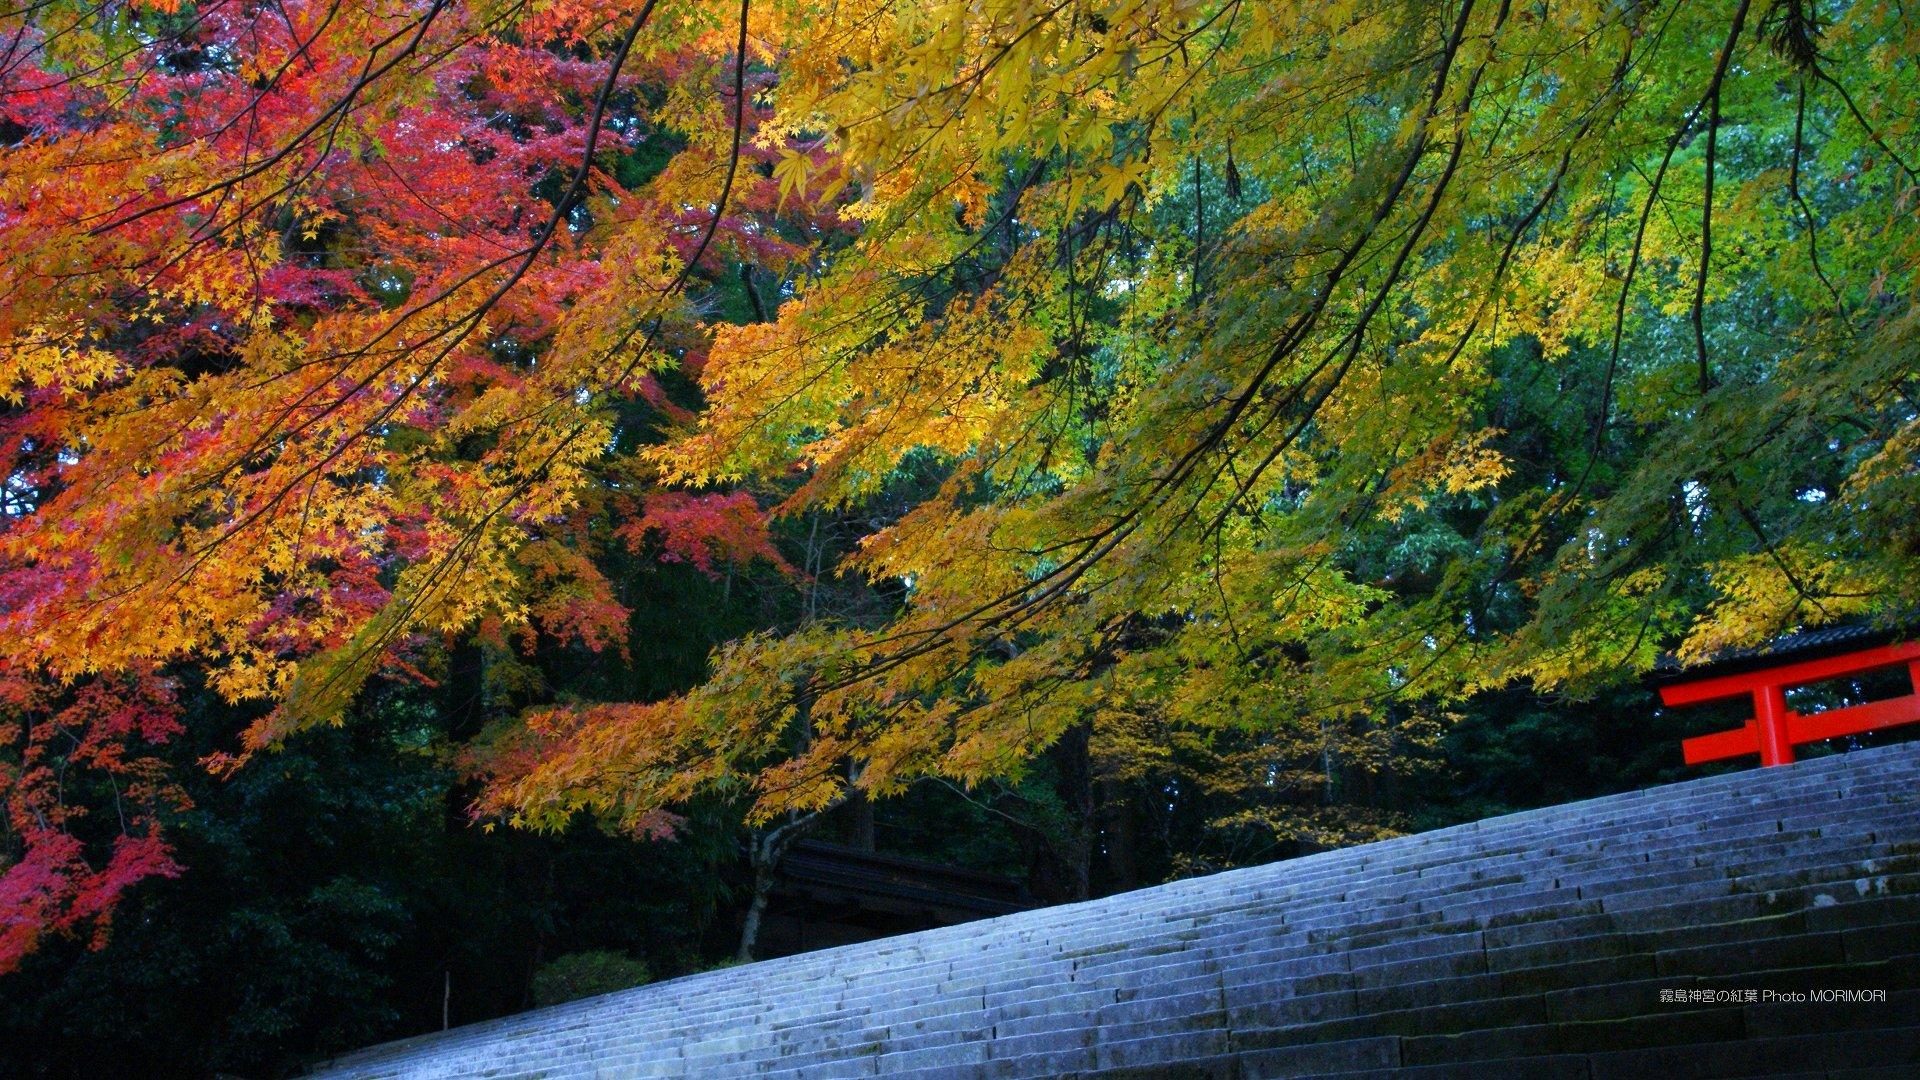 Autumn Leaf Viewing : 単位 水 : すべての講義